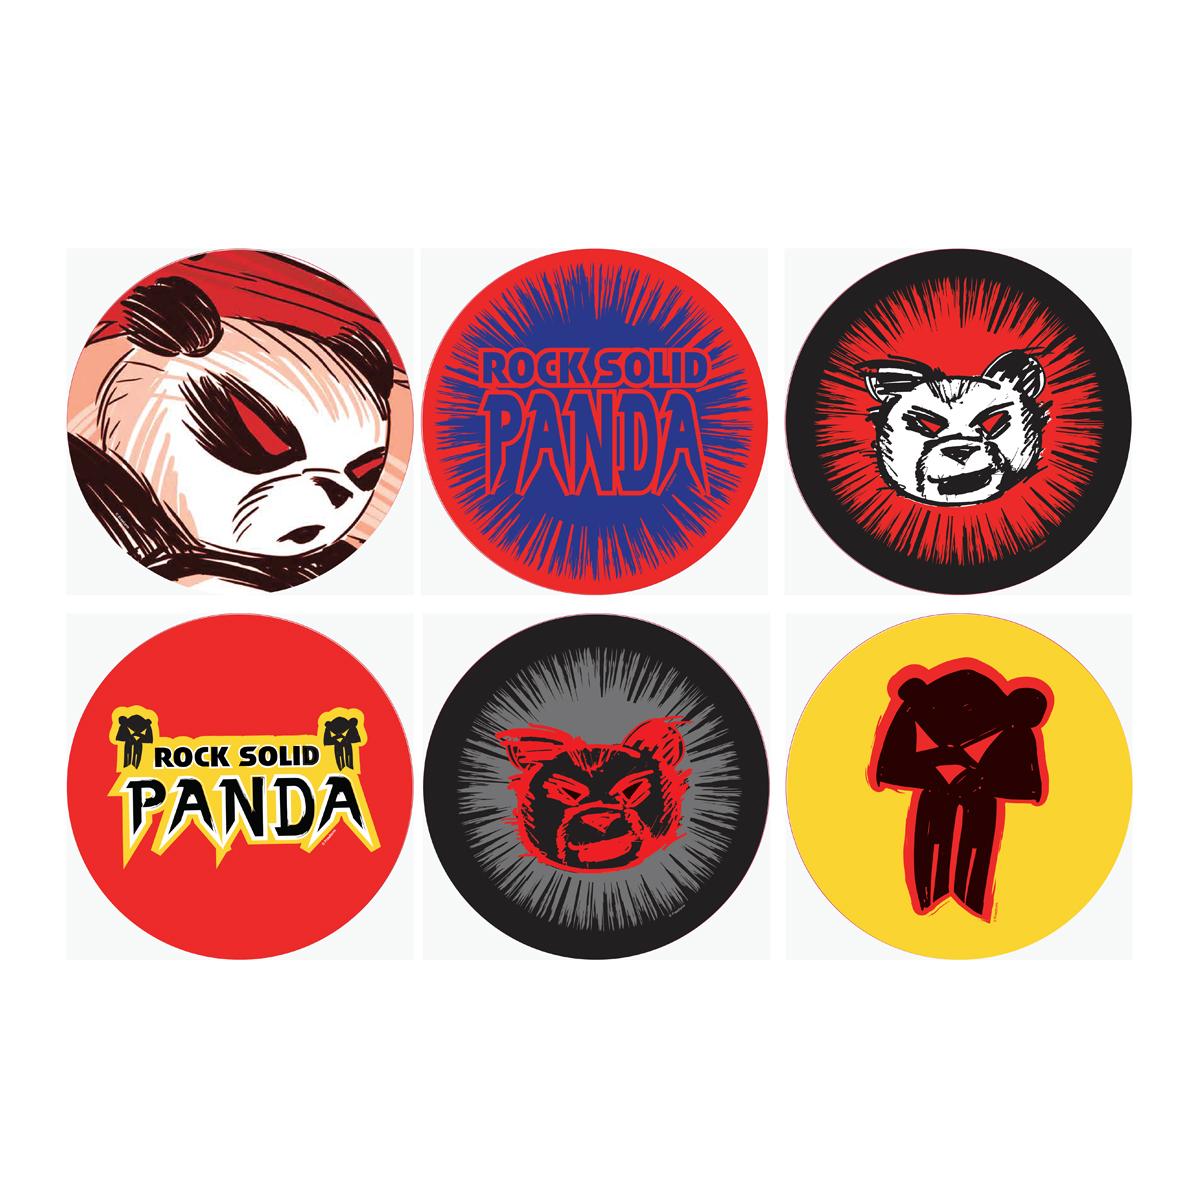 Shadowhunters Rock Solid Panda Sticker Set